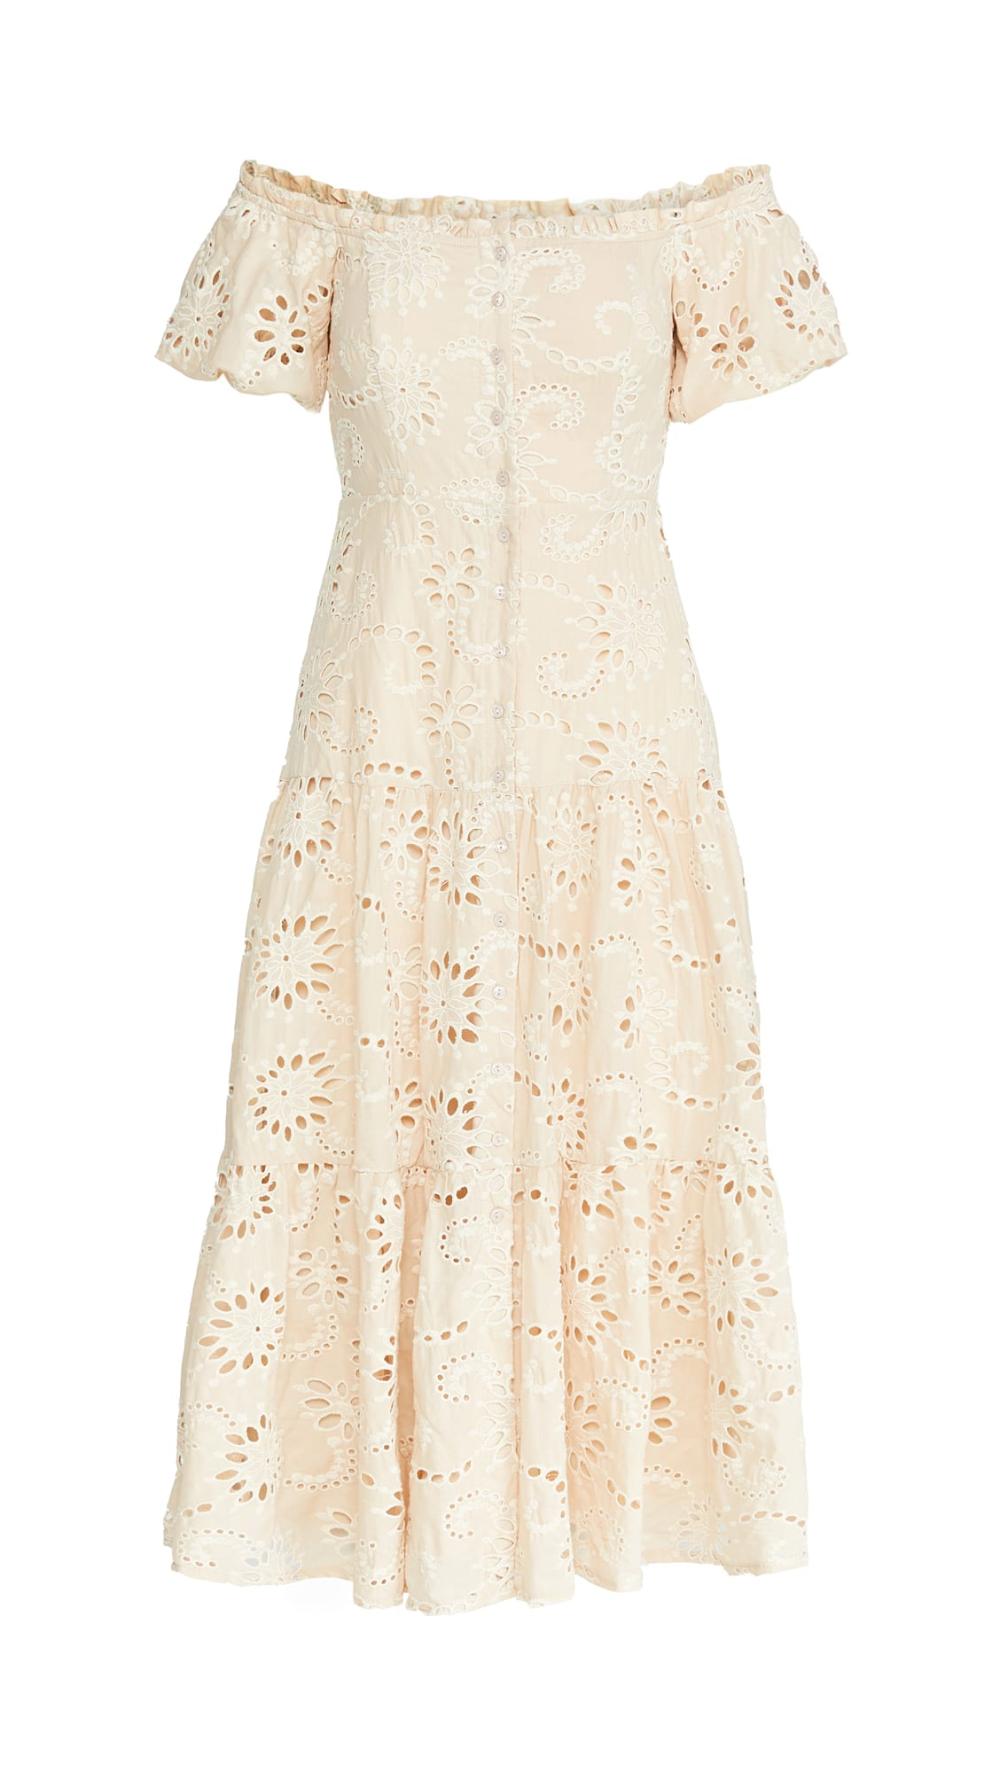 Astr The Label Te Amo Dress We Select Dresses Dresses Select Dress Summer Day Dresses [ 1773 x 1000 Pixel ]